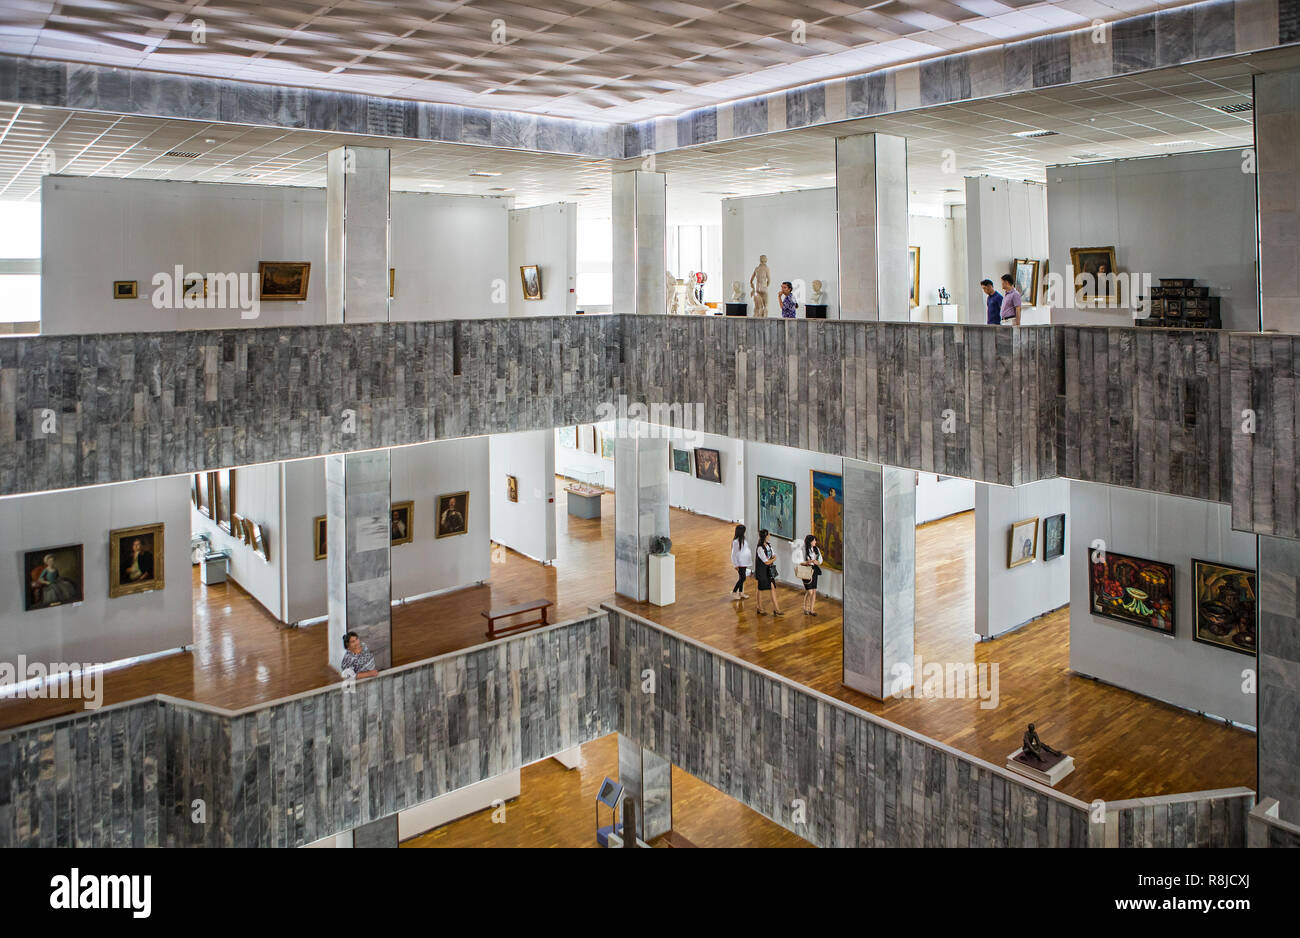 The State Museum Of Arts Of Uzbekistan Or State Fine Arts Museum 16 Amir Temur Avenue Tashkent Uzbekistan Stock Photo Alamy